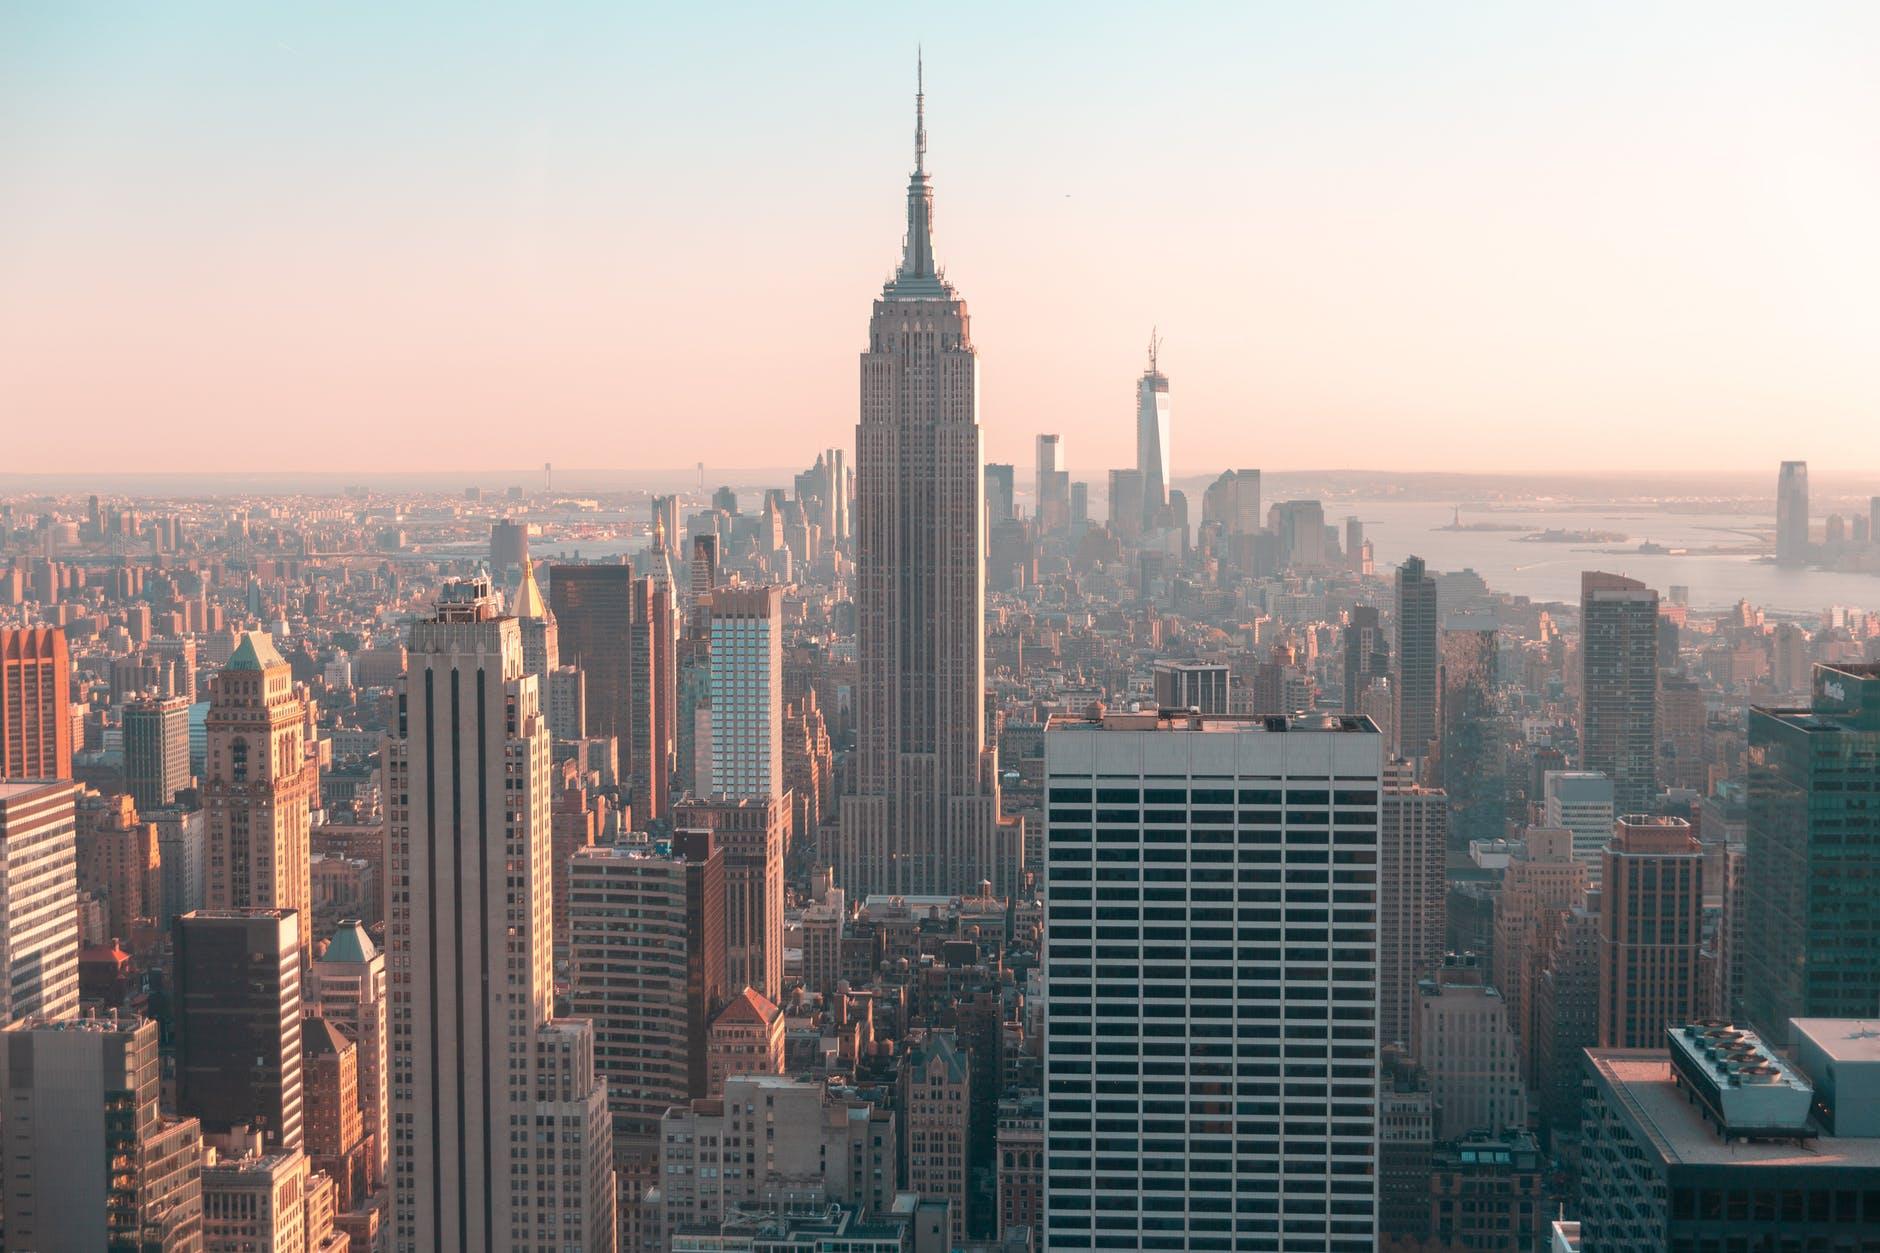 New York City Co-op vs Condo